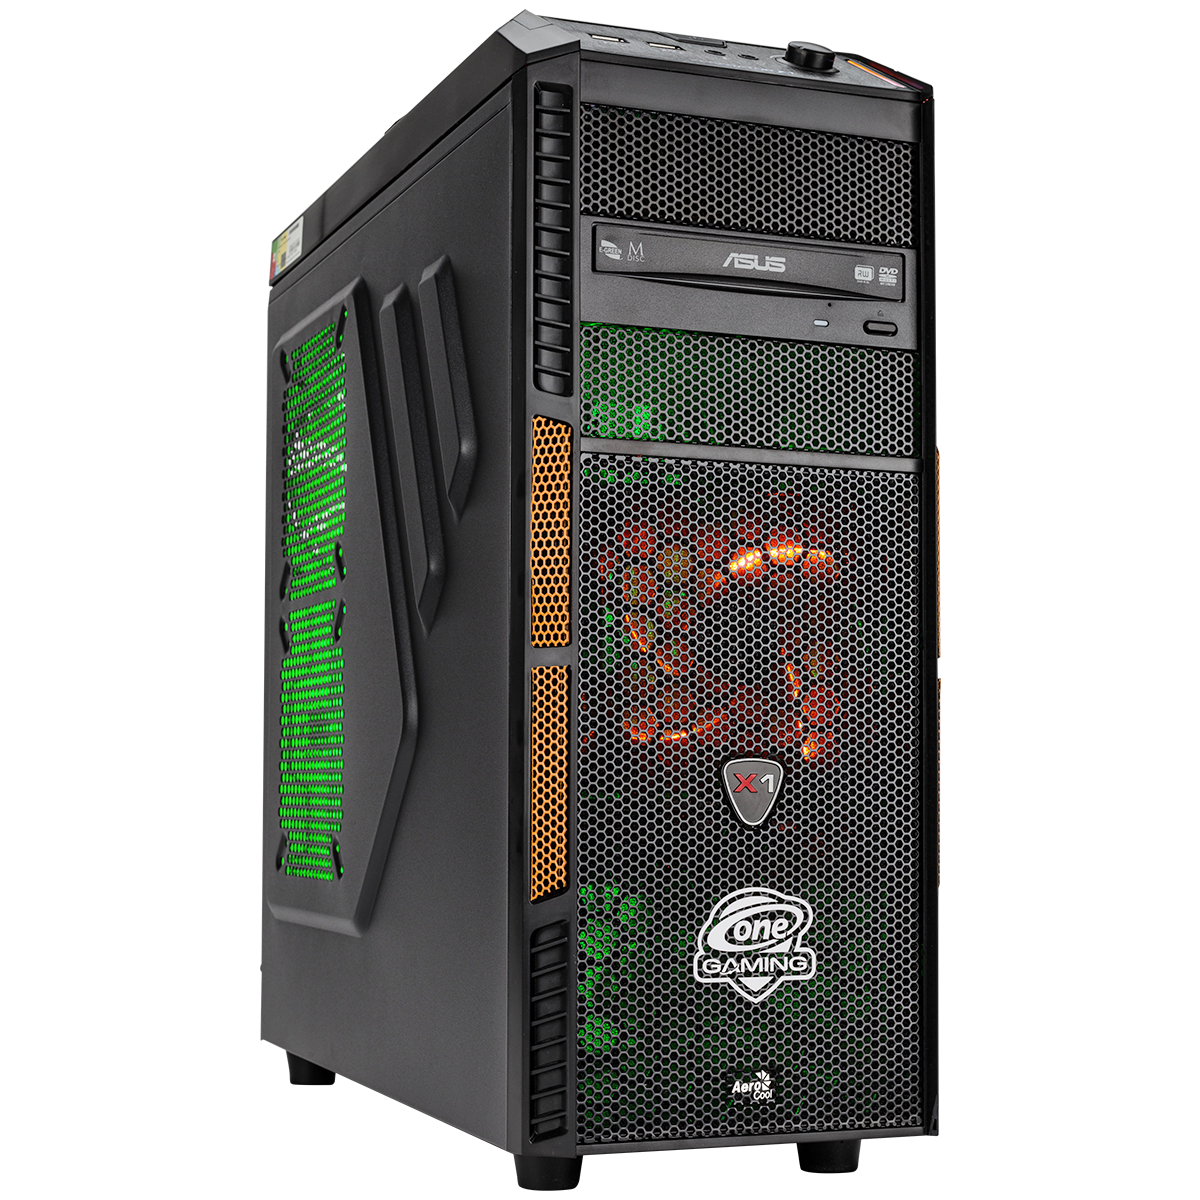 ONE GAMING Premium Computer AR03, anpassbar im ONE PC - Konfigurator